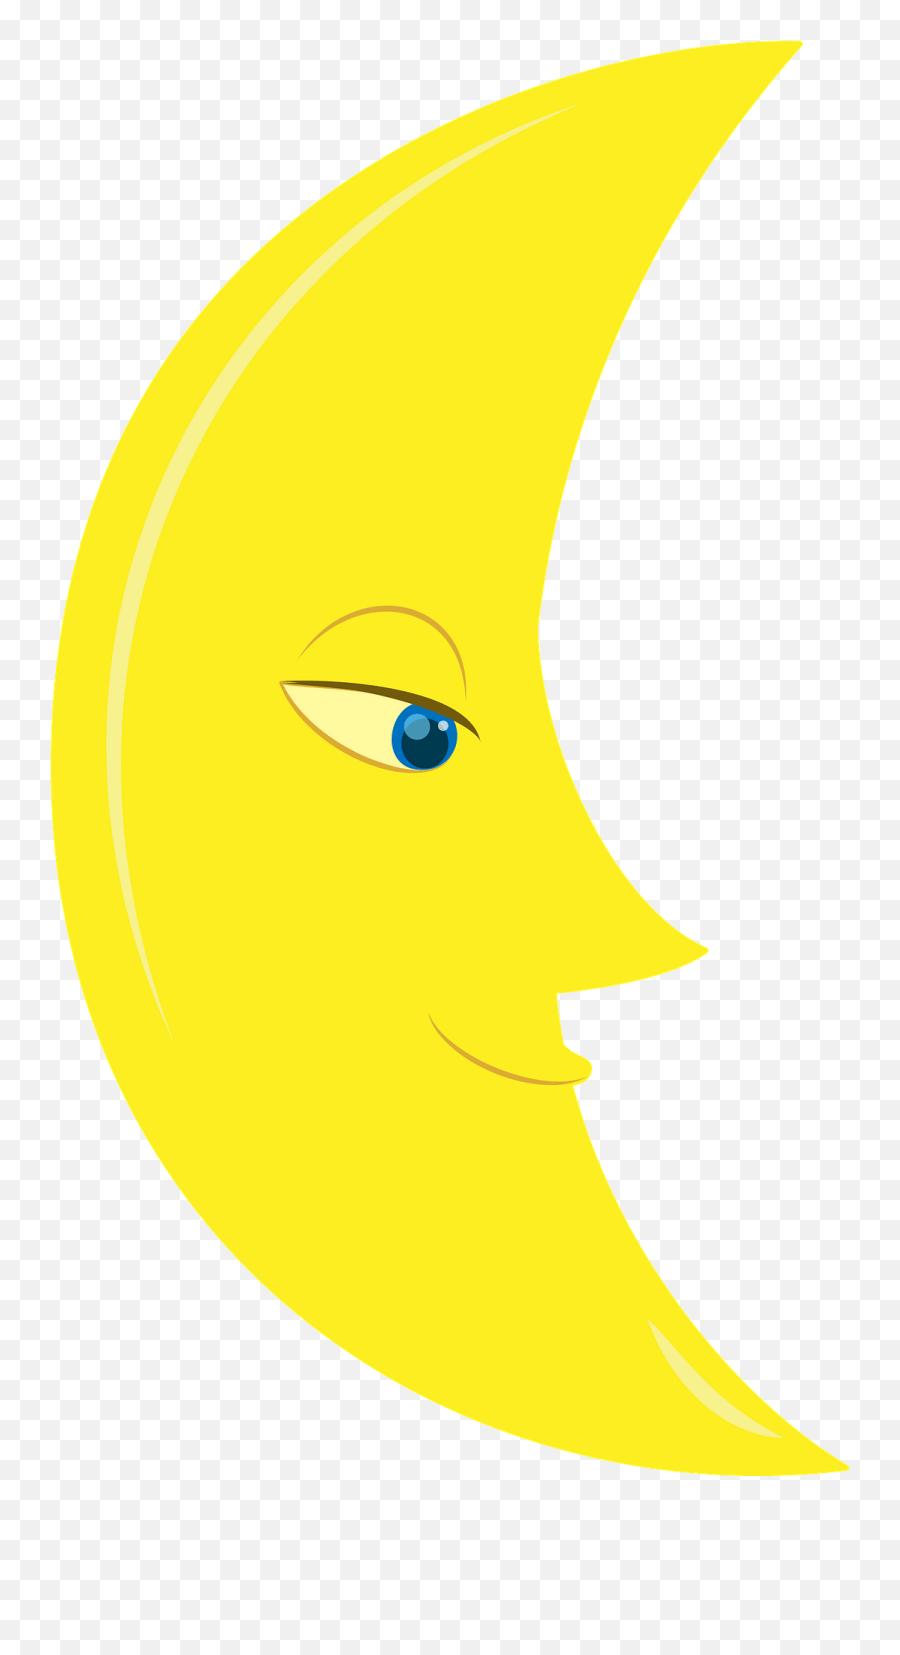 Moon Face Clipart Free Download Transparent Png Creazilla - Happy Emoji,Half Smile Emoji